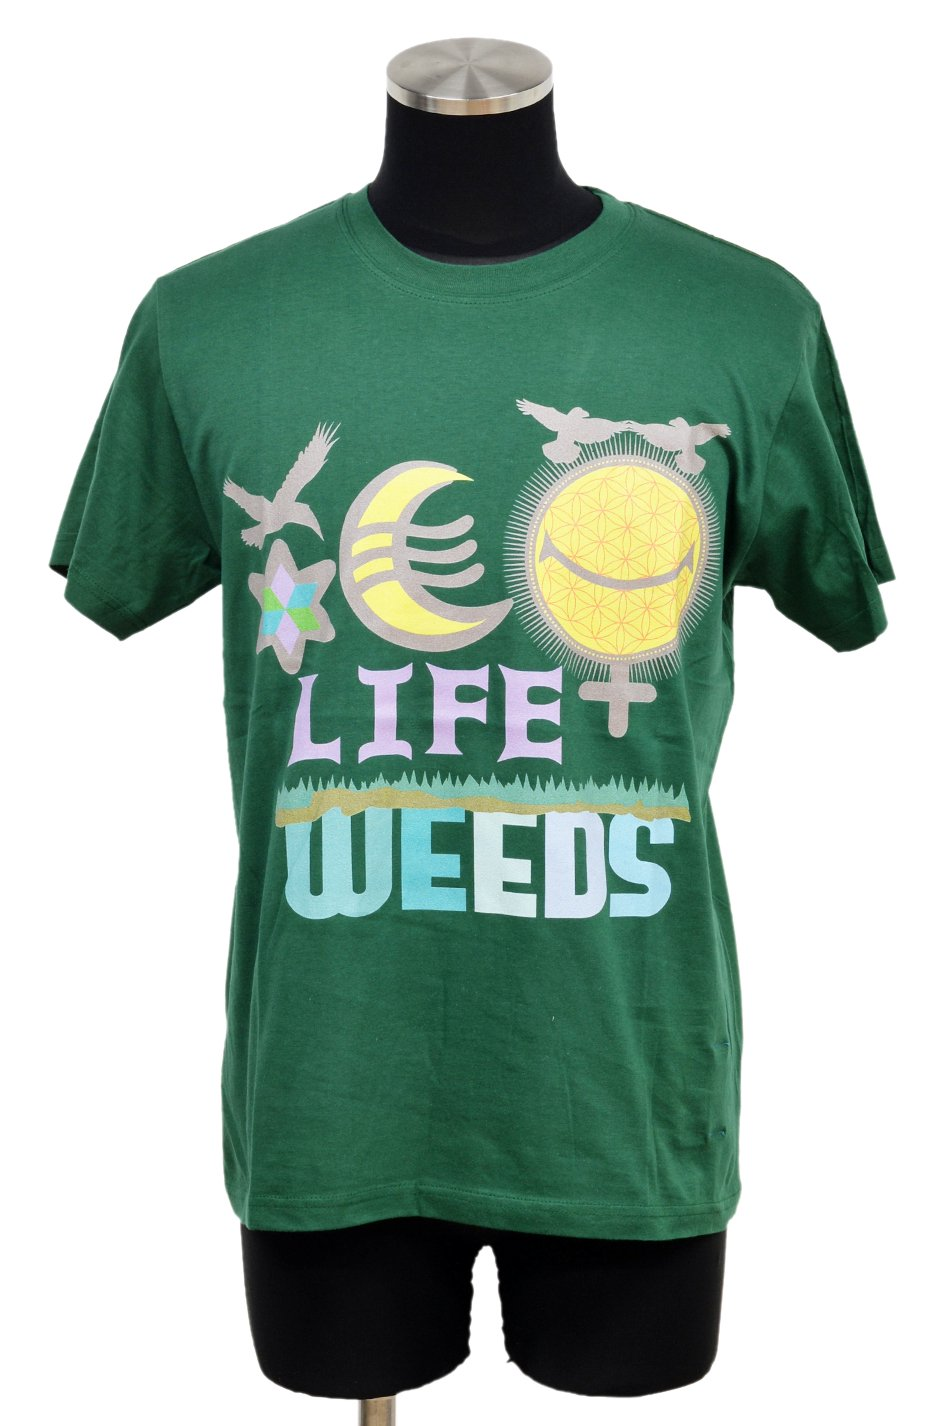 40%off! ARIGATO FAKKYU - アリガトファッキュ 雑草 LIFE WEEDS T-Shirt / Green